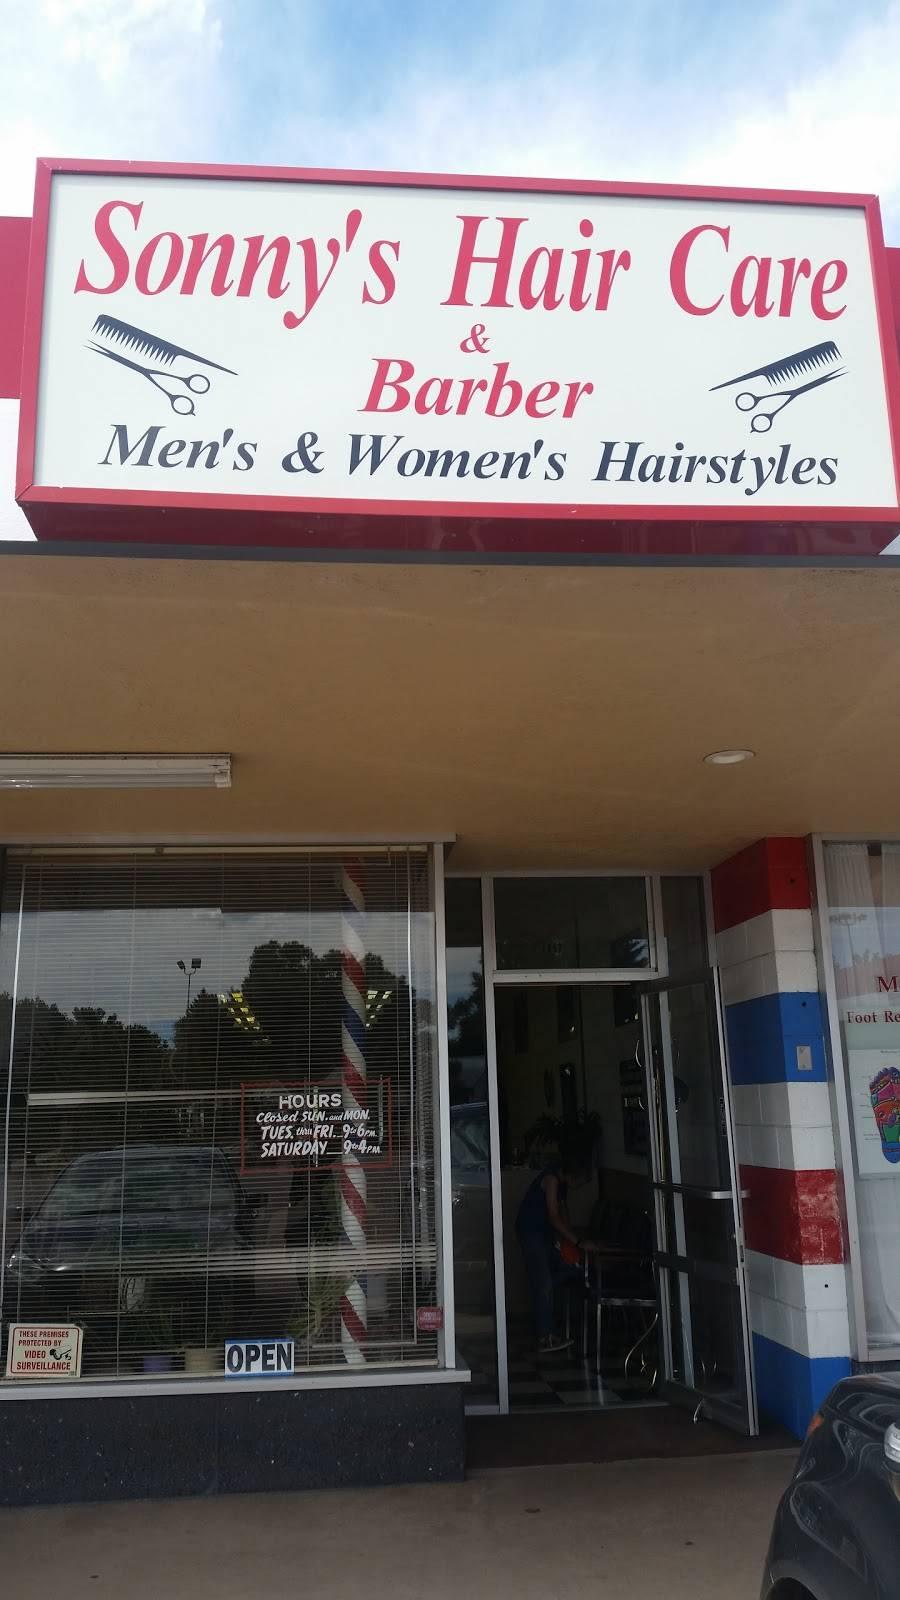 Sonnys Hair Care - hair care    Photo 2 of 2   Address: 1857 N Circle Dr, Colorado Springs, CO 80909, USA   Phone: (719) 636-1488